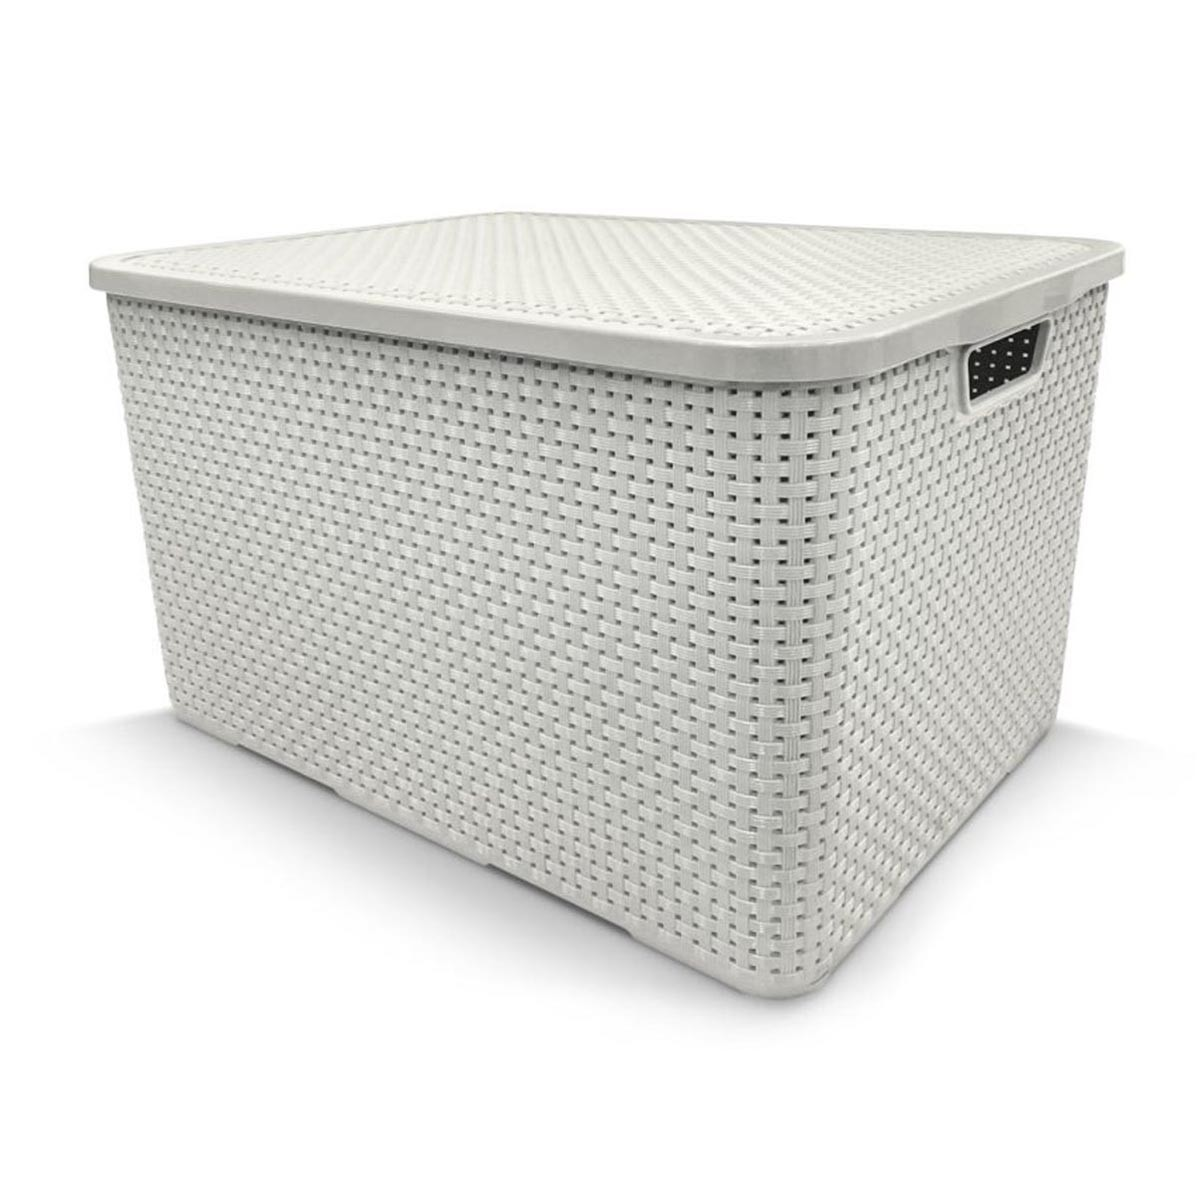 Caixa Organizadora Plástica Branca Cesto Rattan 7 Litros Com Tampa